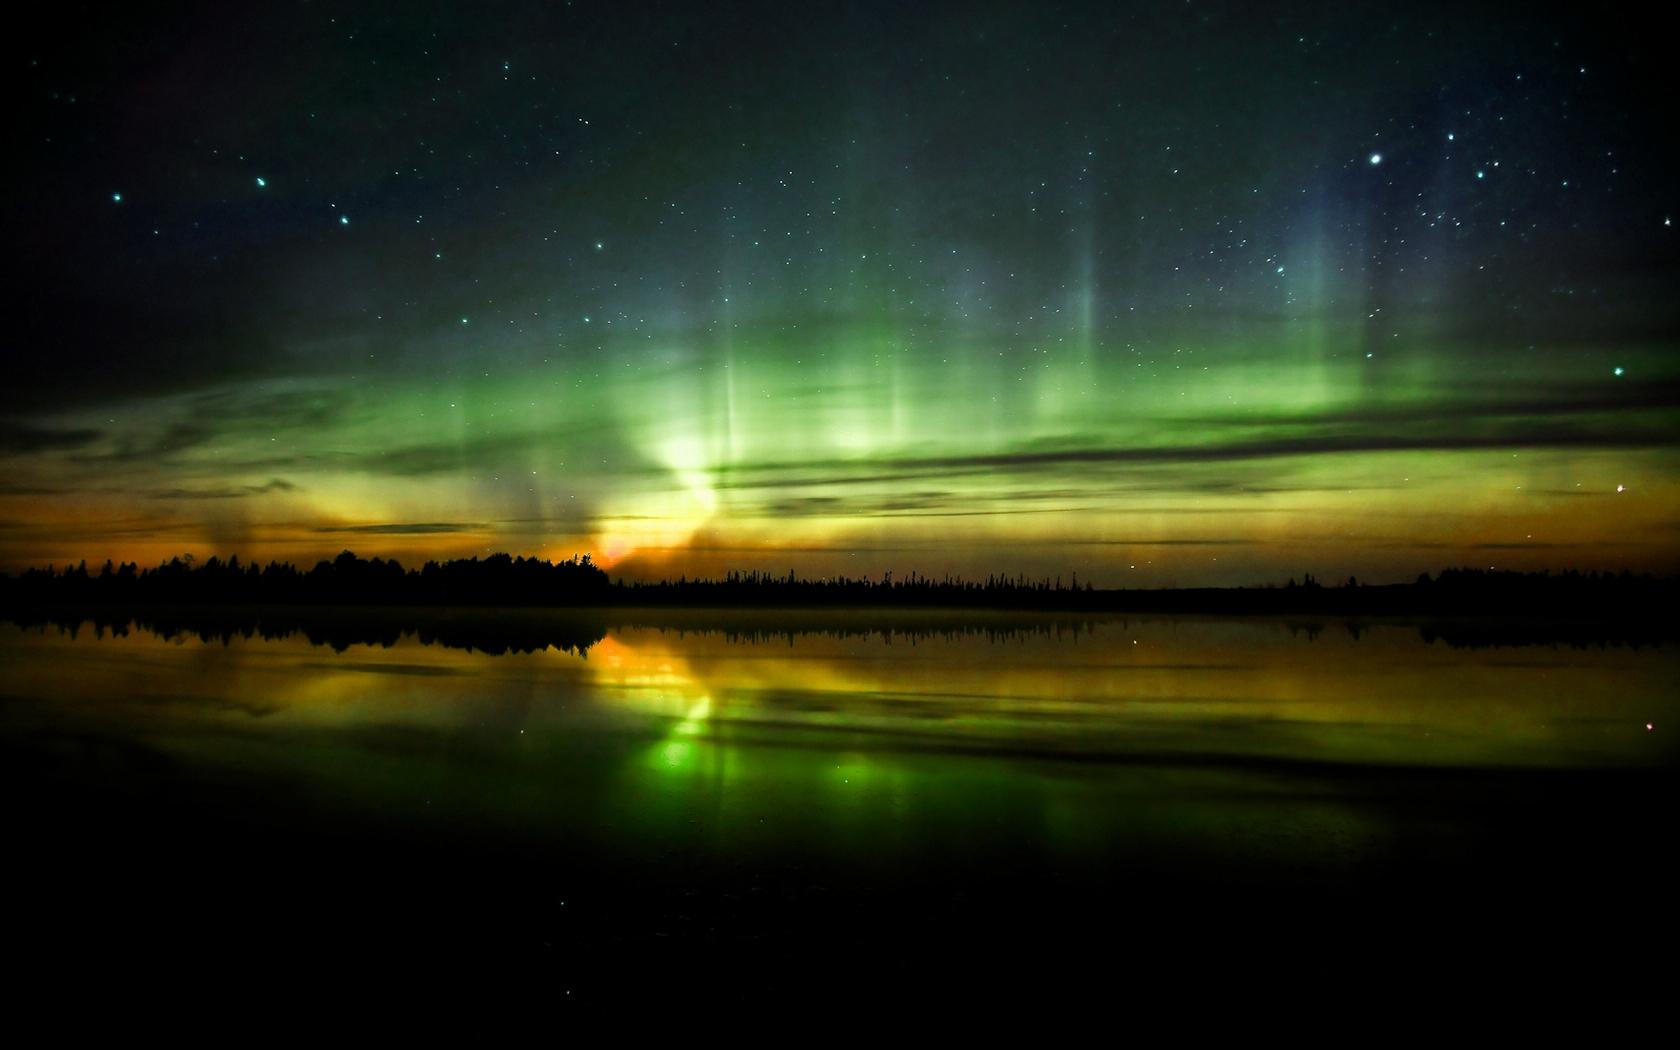 water landscapes night aurora borealis wallpaper | 1680x1050